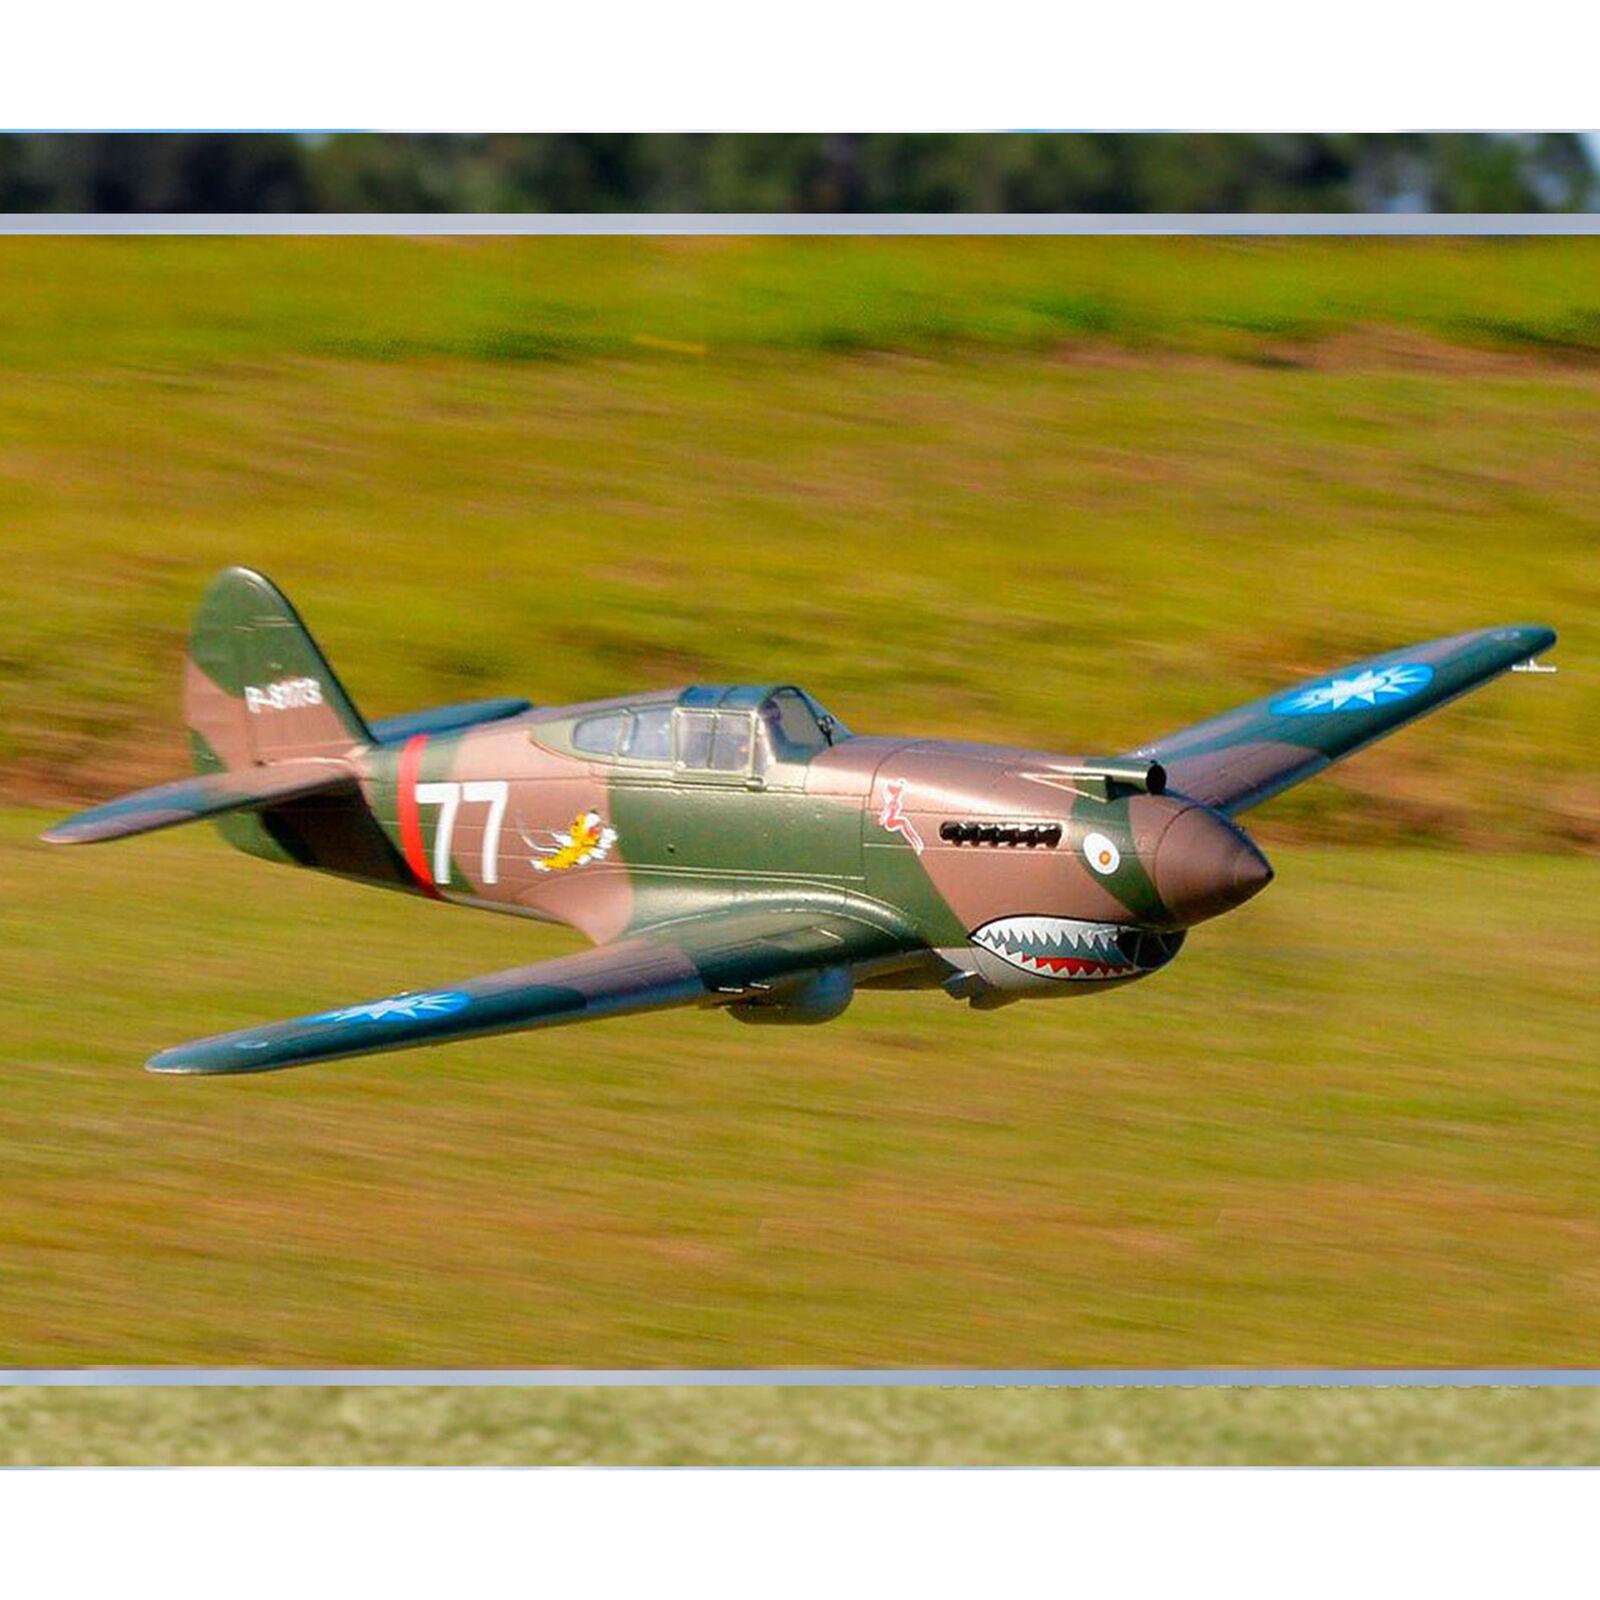 P-40B Tomahawk Flying Tigers PNP, 1400mm